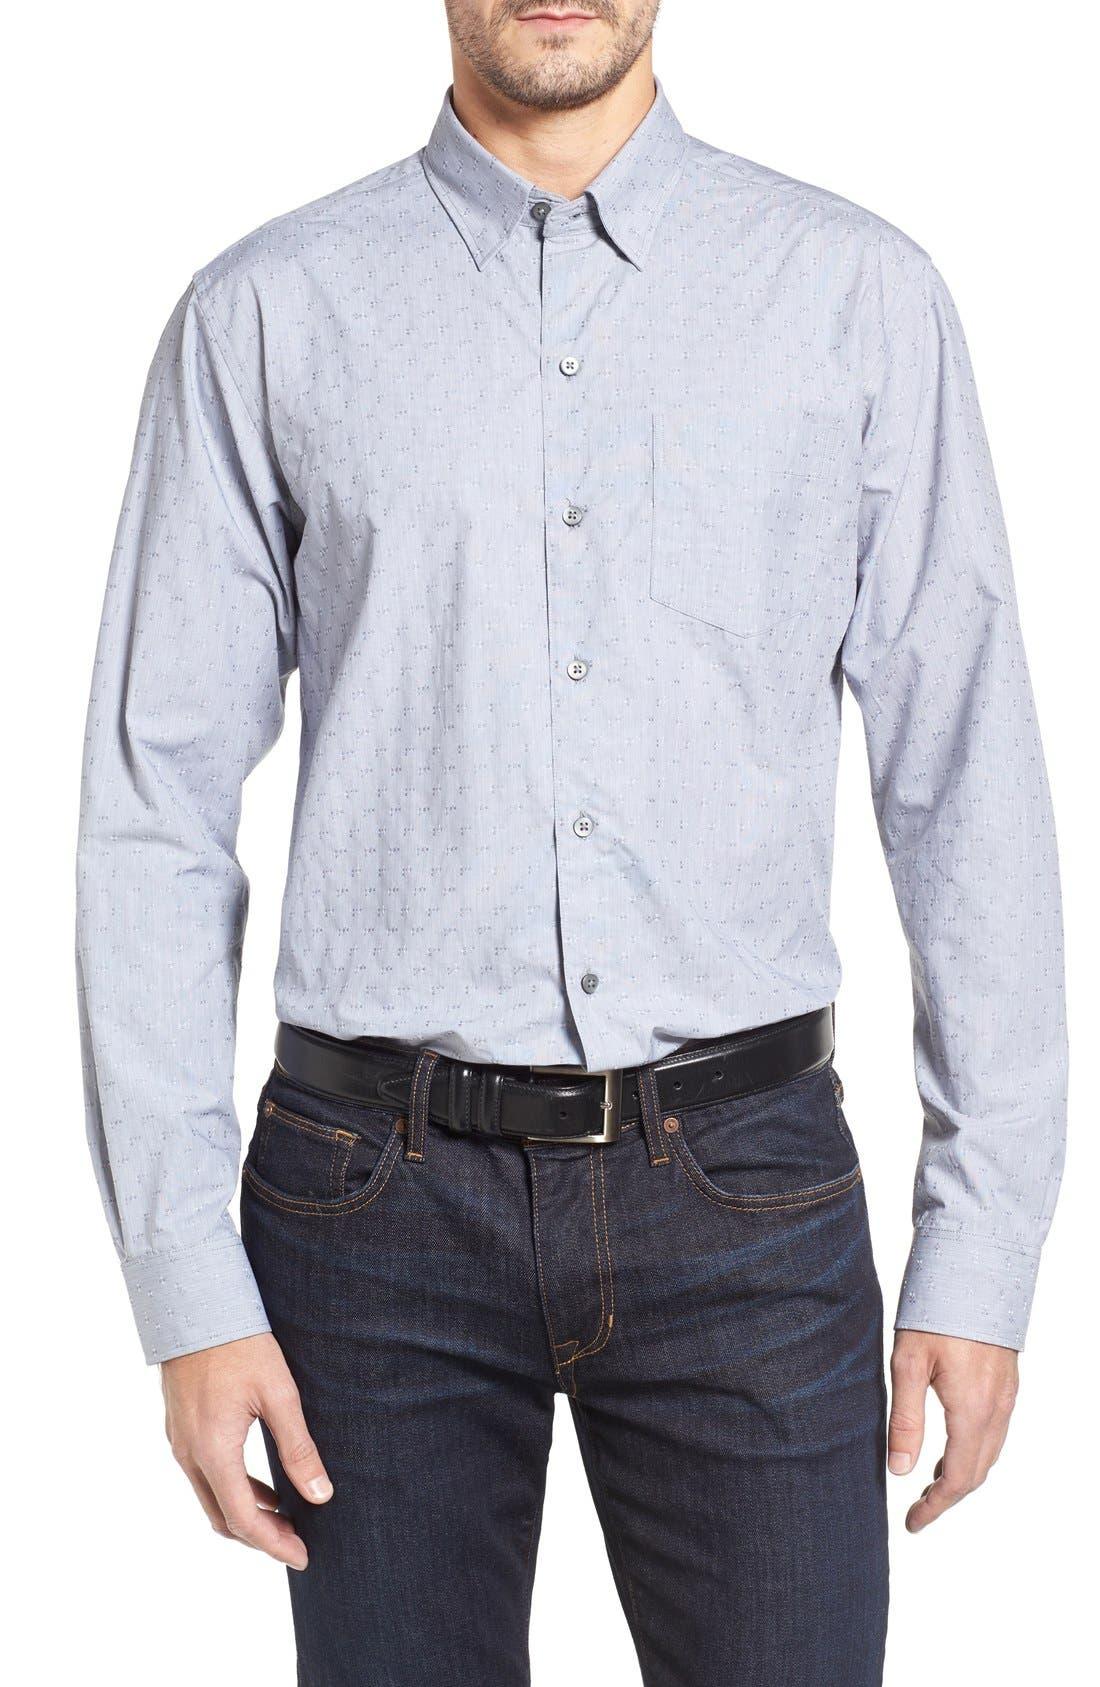 Starboard Jacquard Sport Shirt,                         Main,                         color, Grey/ Multi